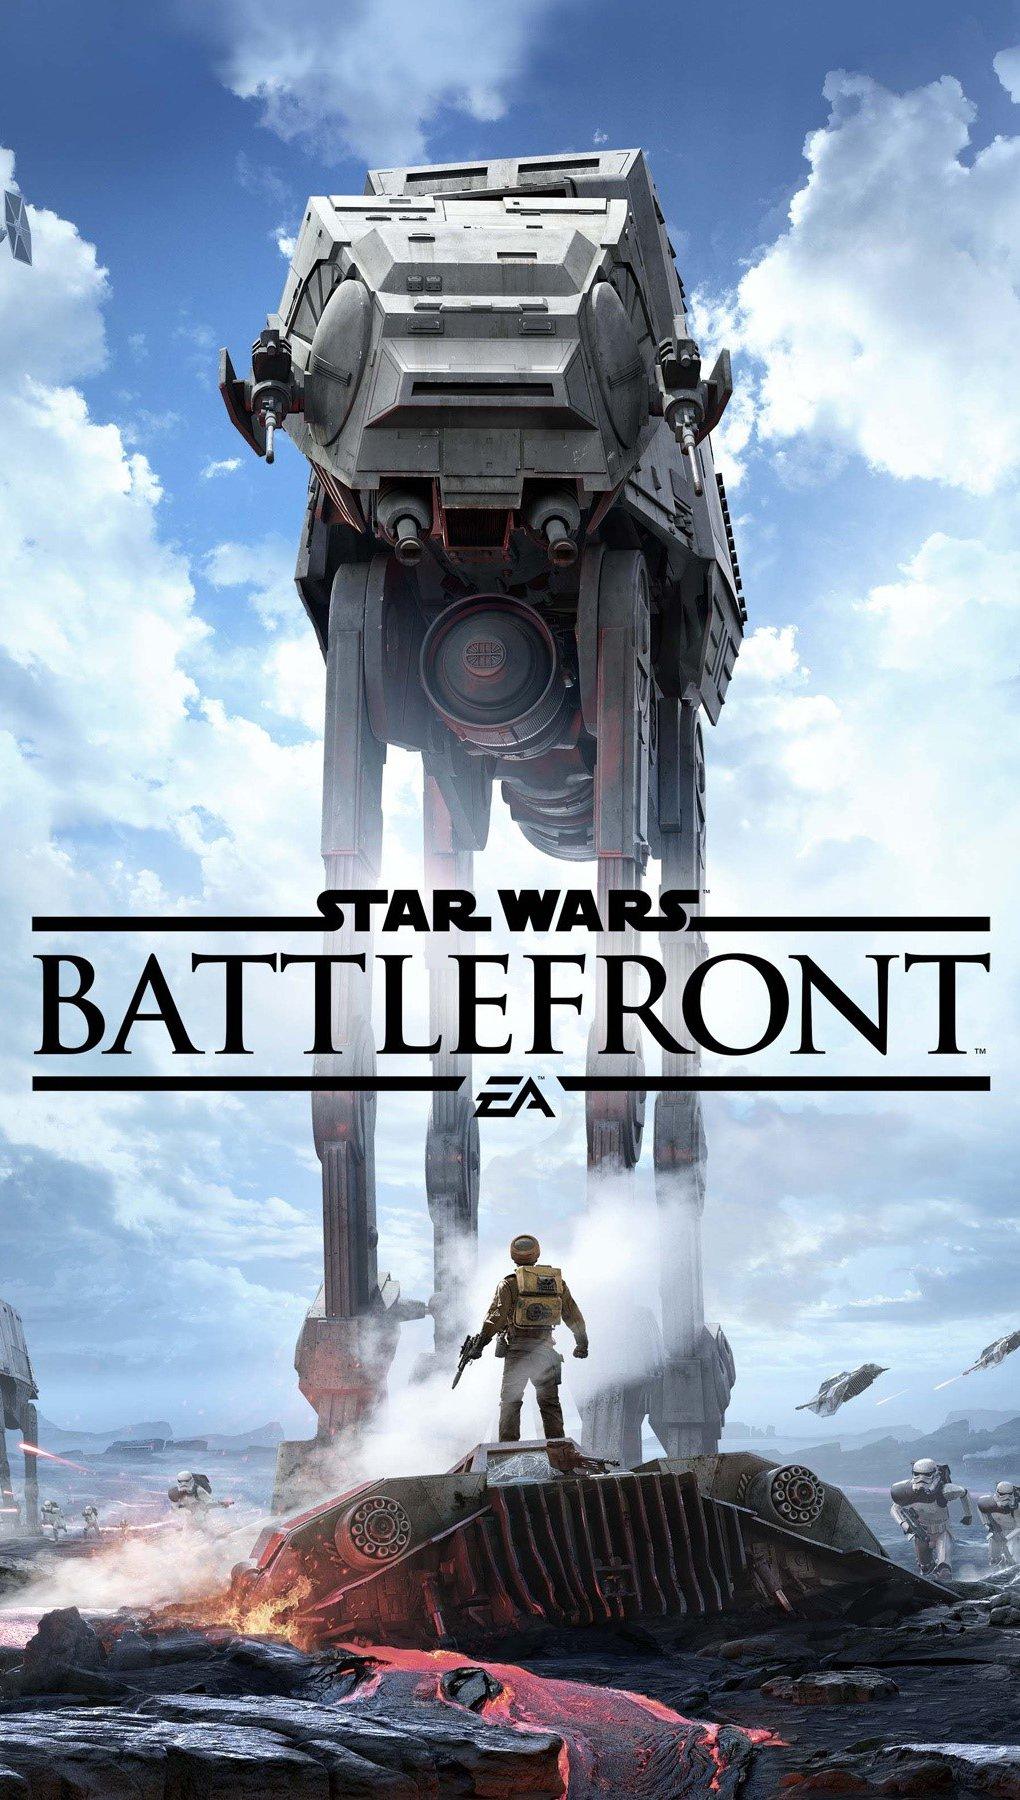 Fondos de pantalla Star wars Battlefront Vertical